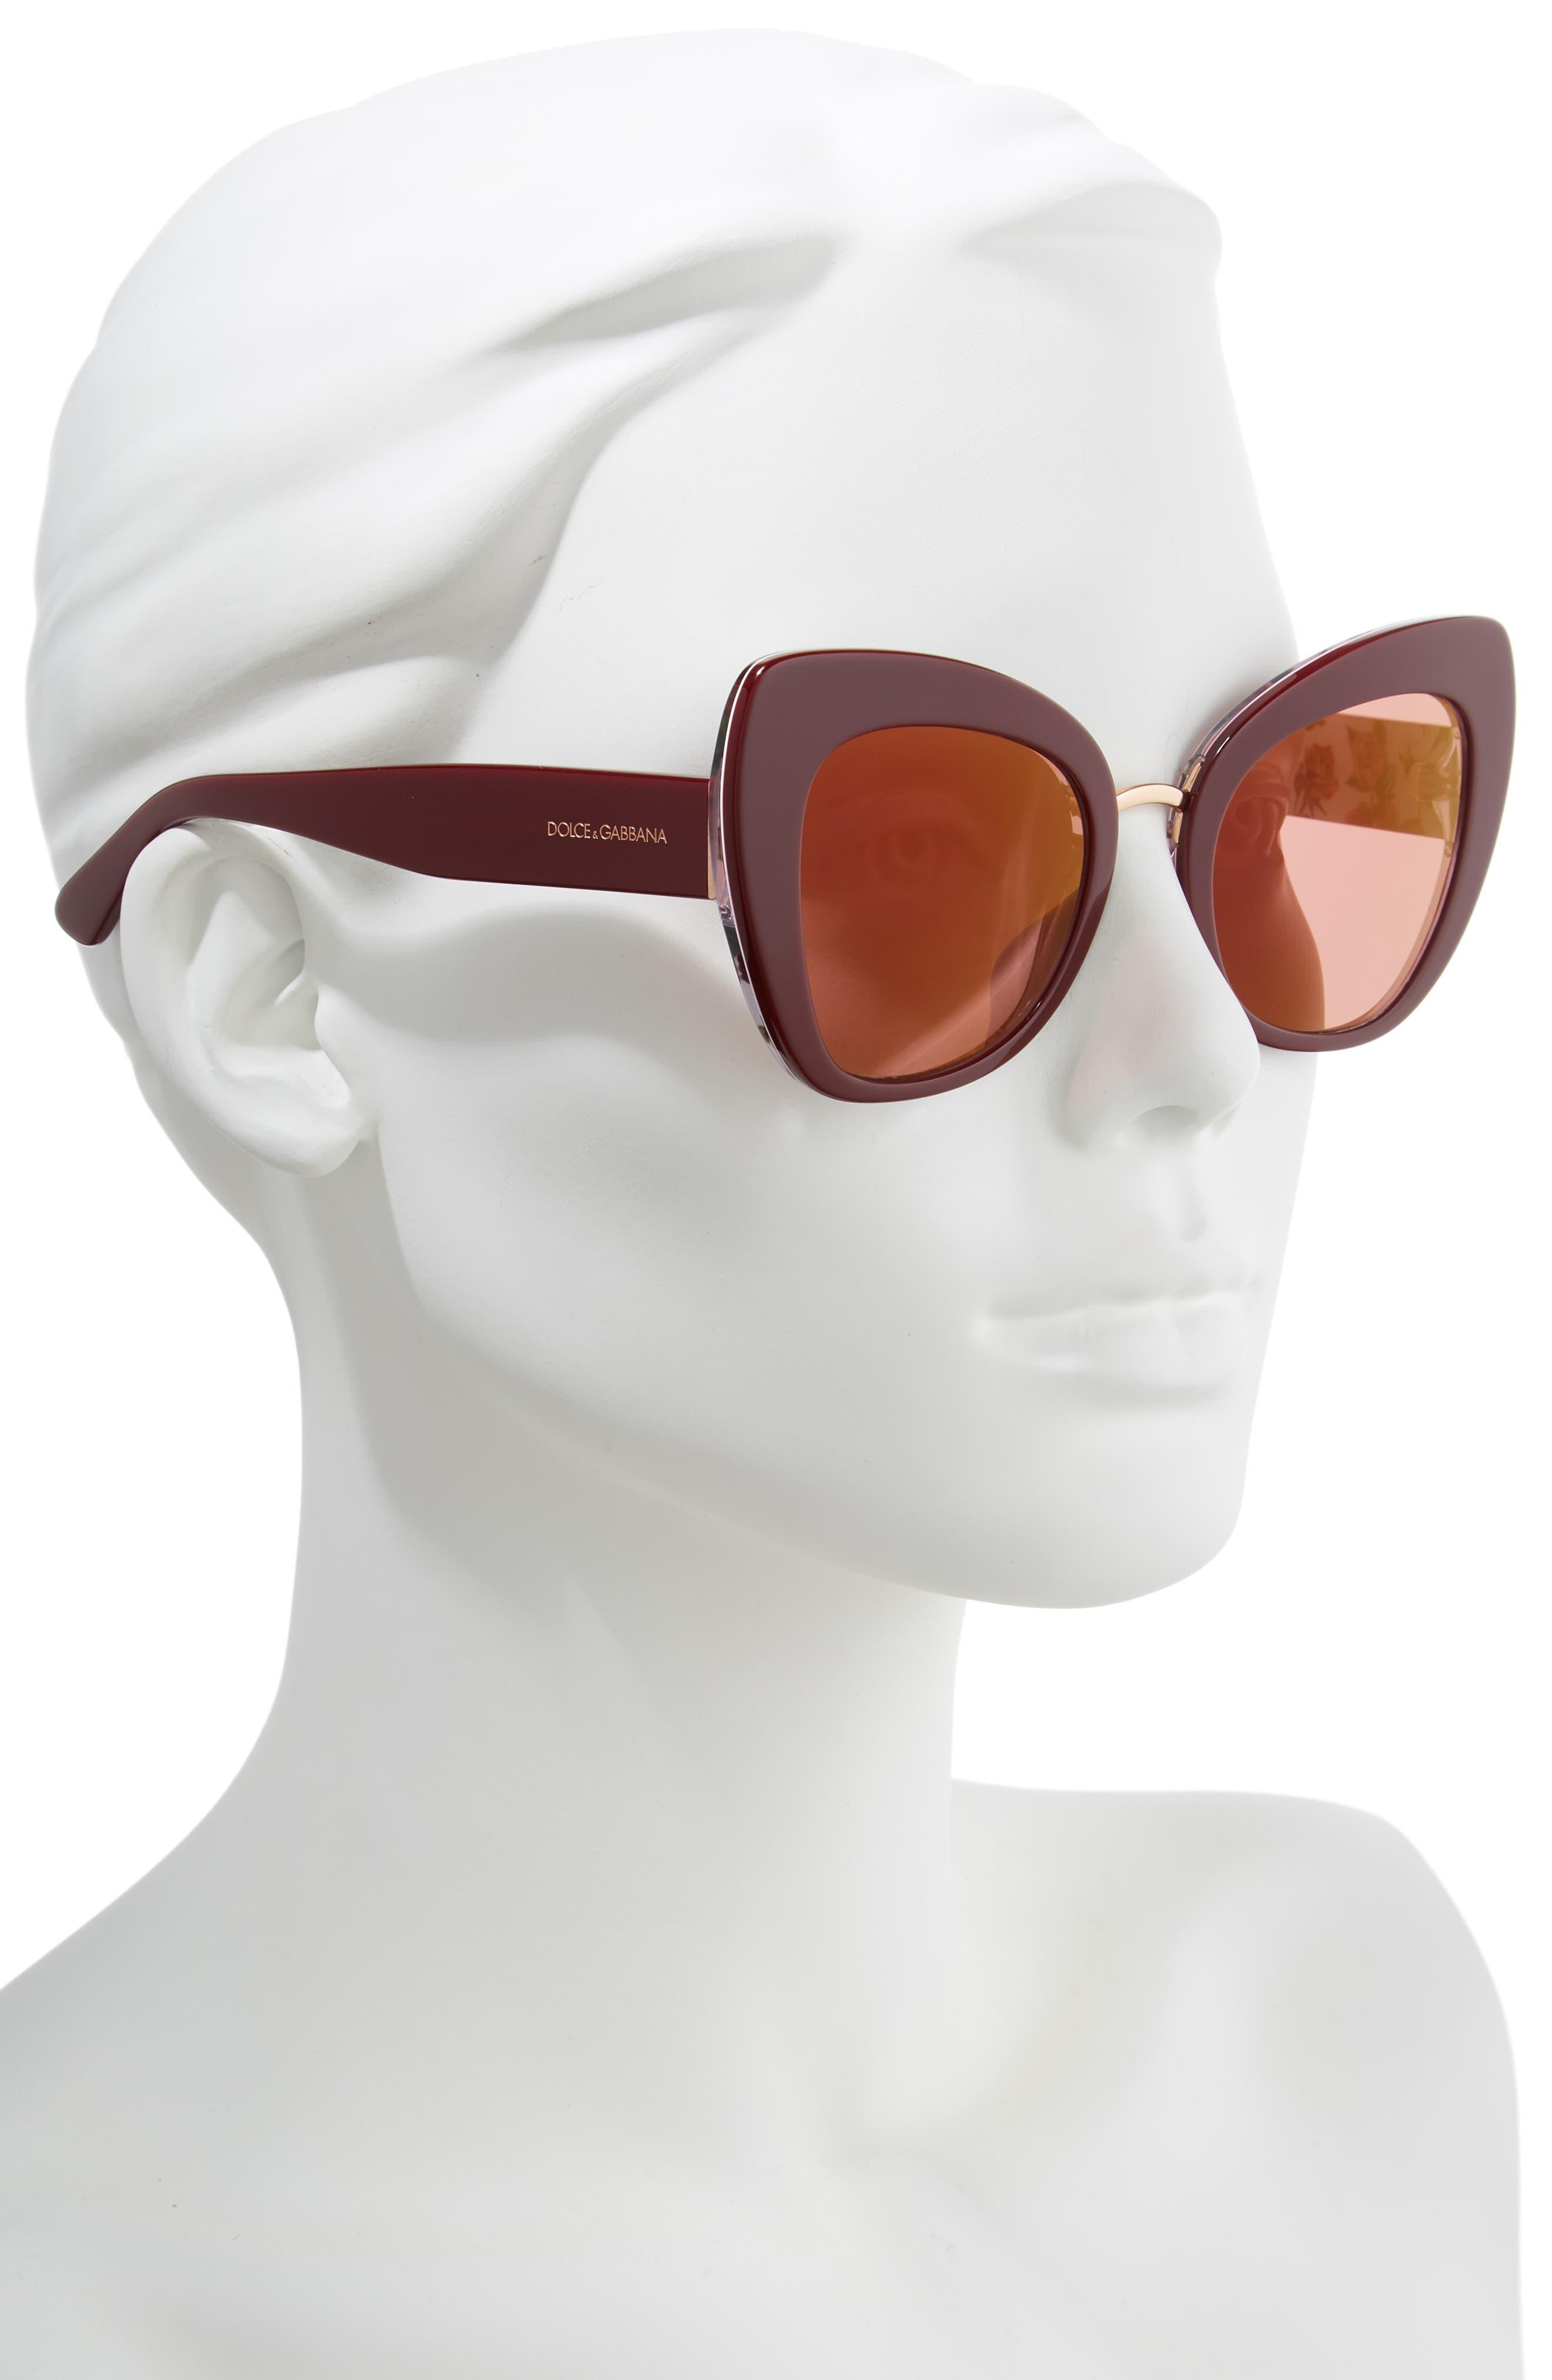 51mm Mirrored Cat Eye Sunglasses,                             Alternate thumbnail 2, color,                             PURPLE/ RED MIRROR